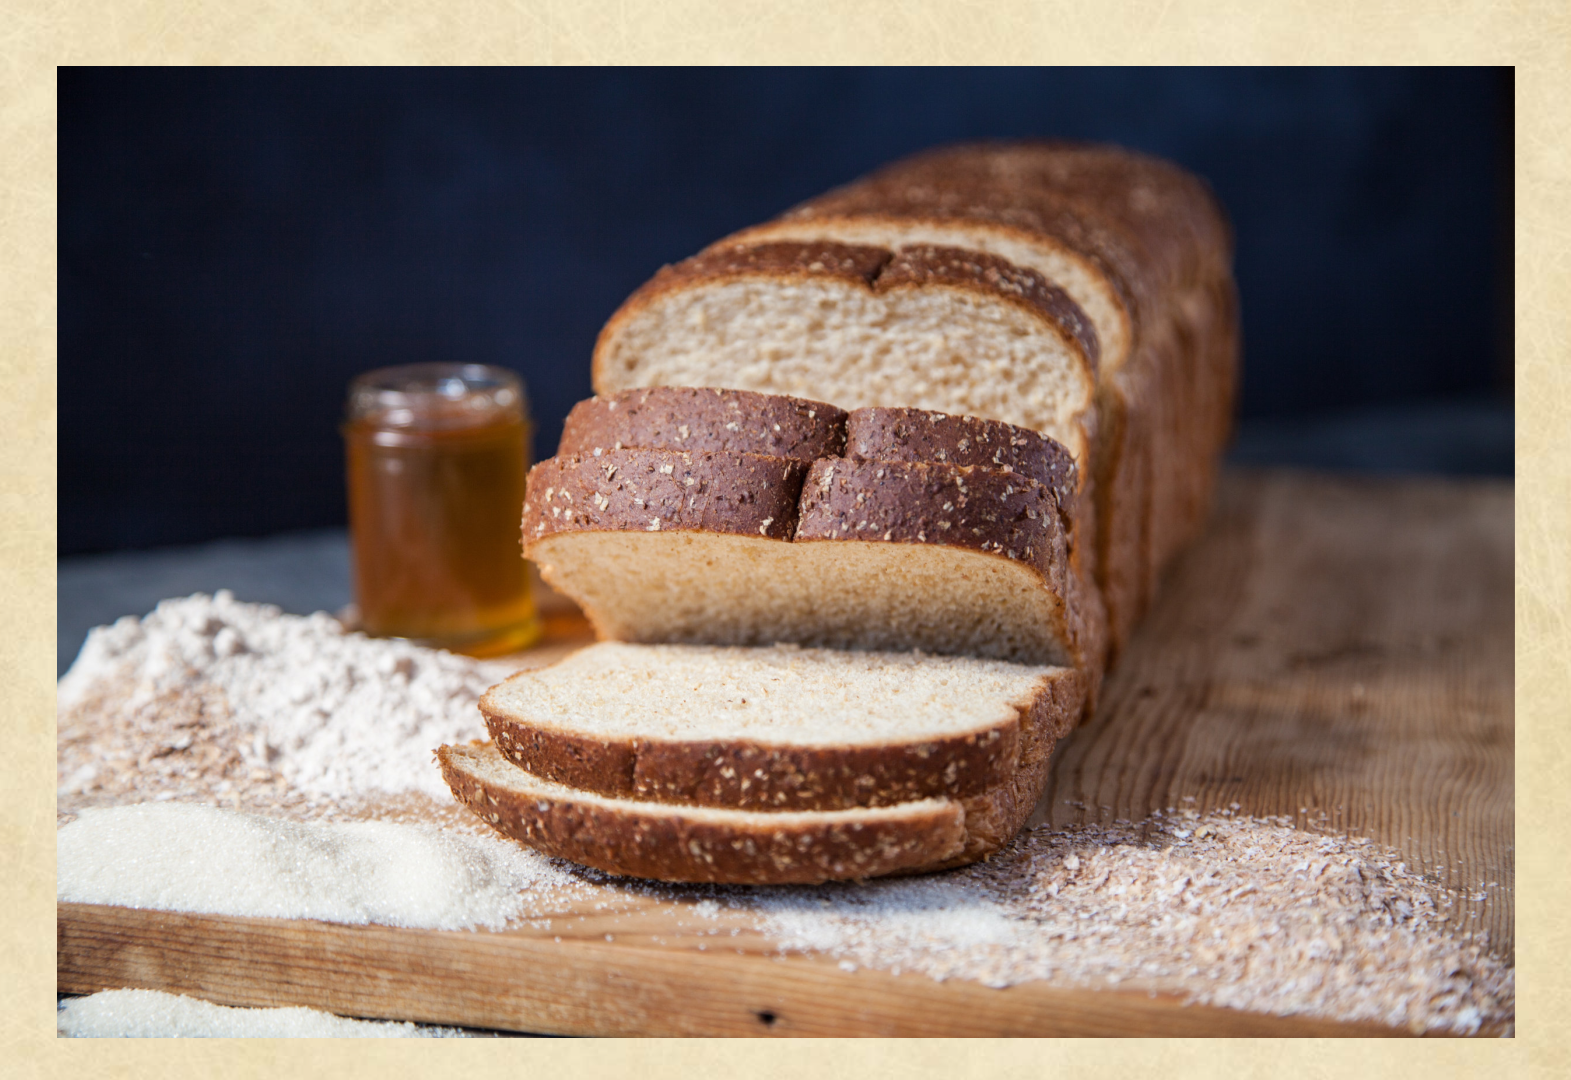 Loaf of sliced Koepplinger's All Natural Non-GMO bread